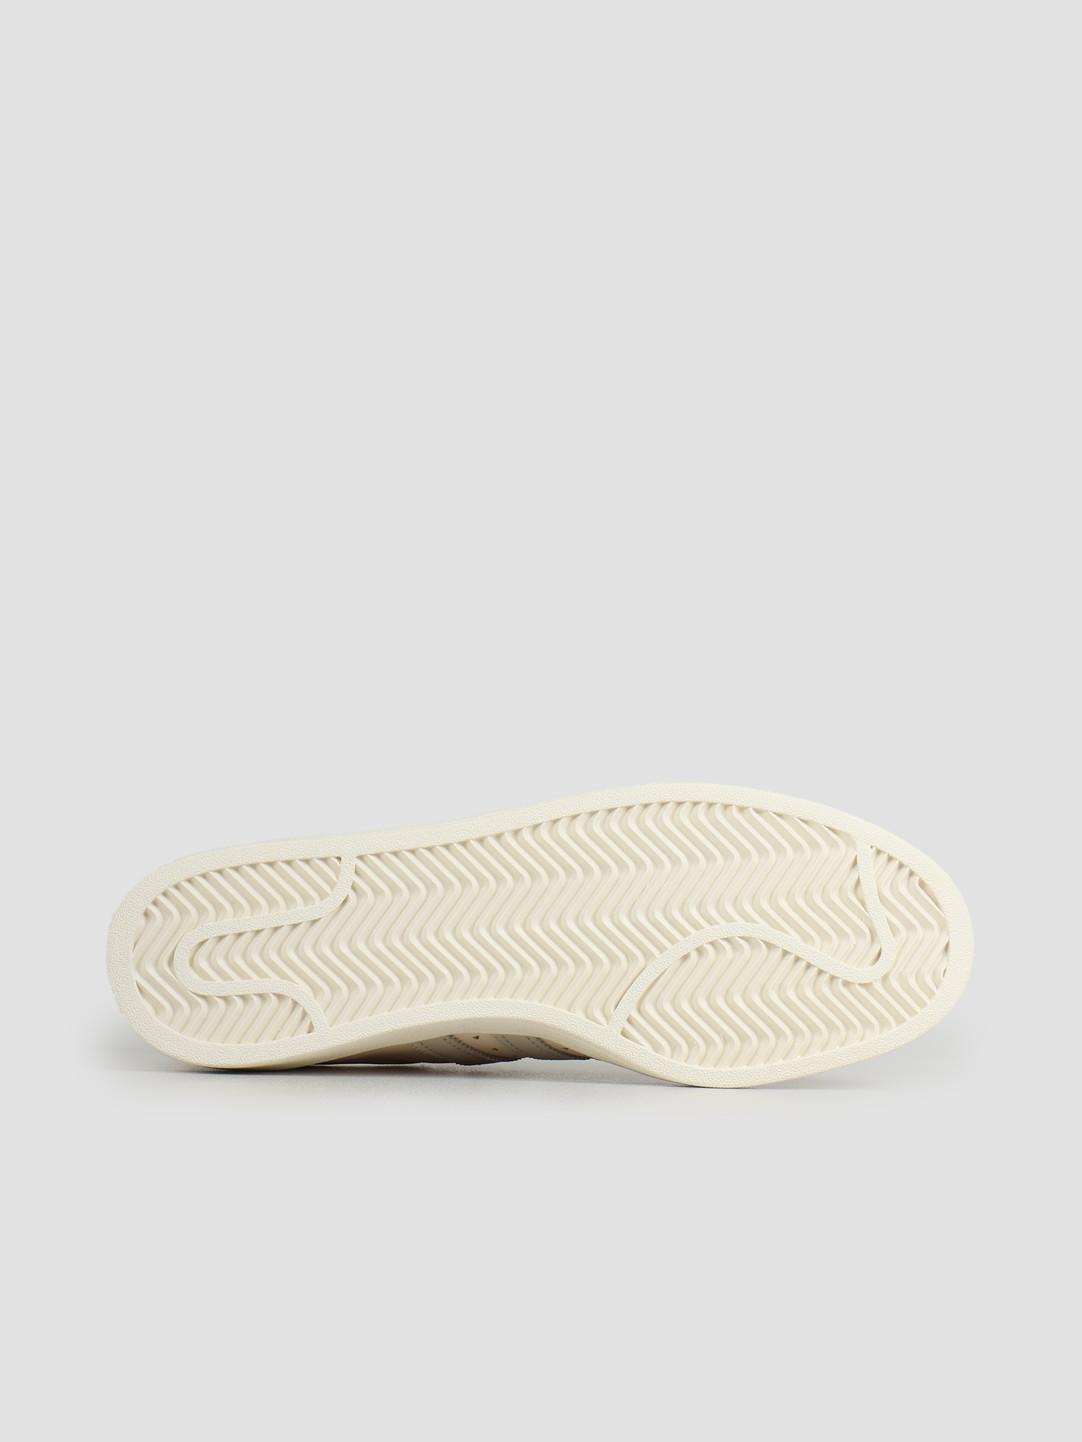 adidas adidas Pw Campus Ecru Tint Core White Core Brown FX8025